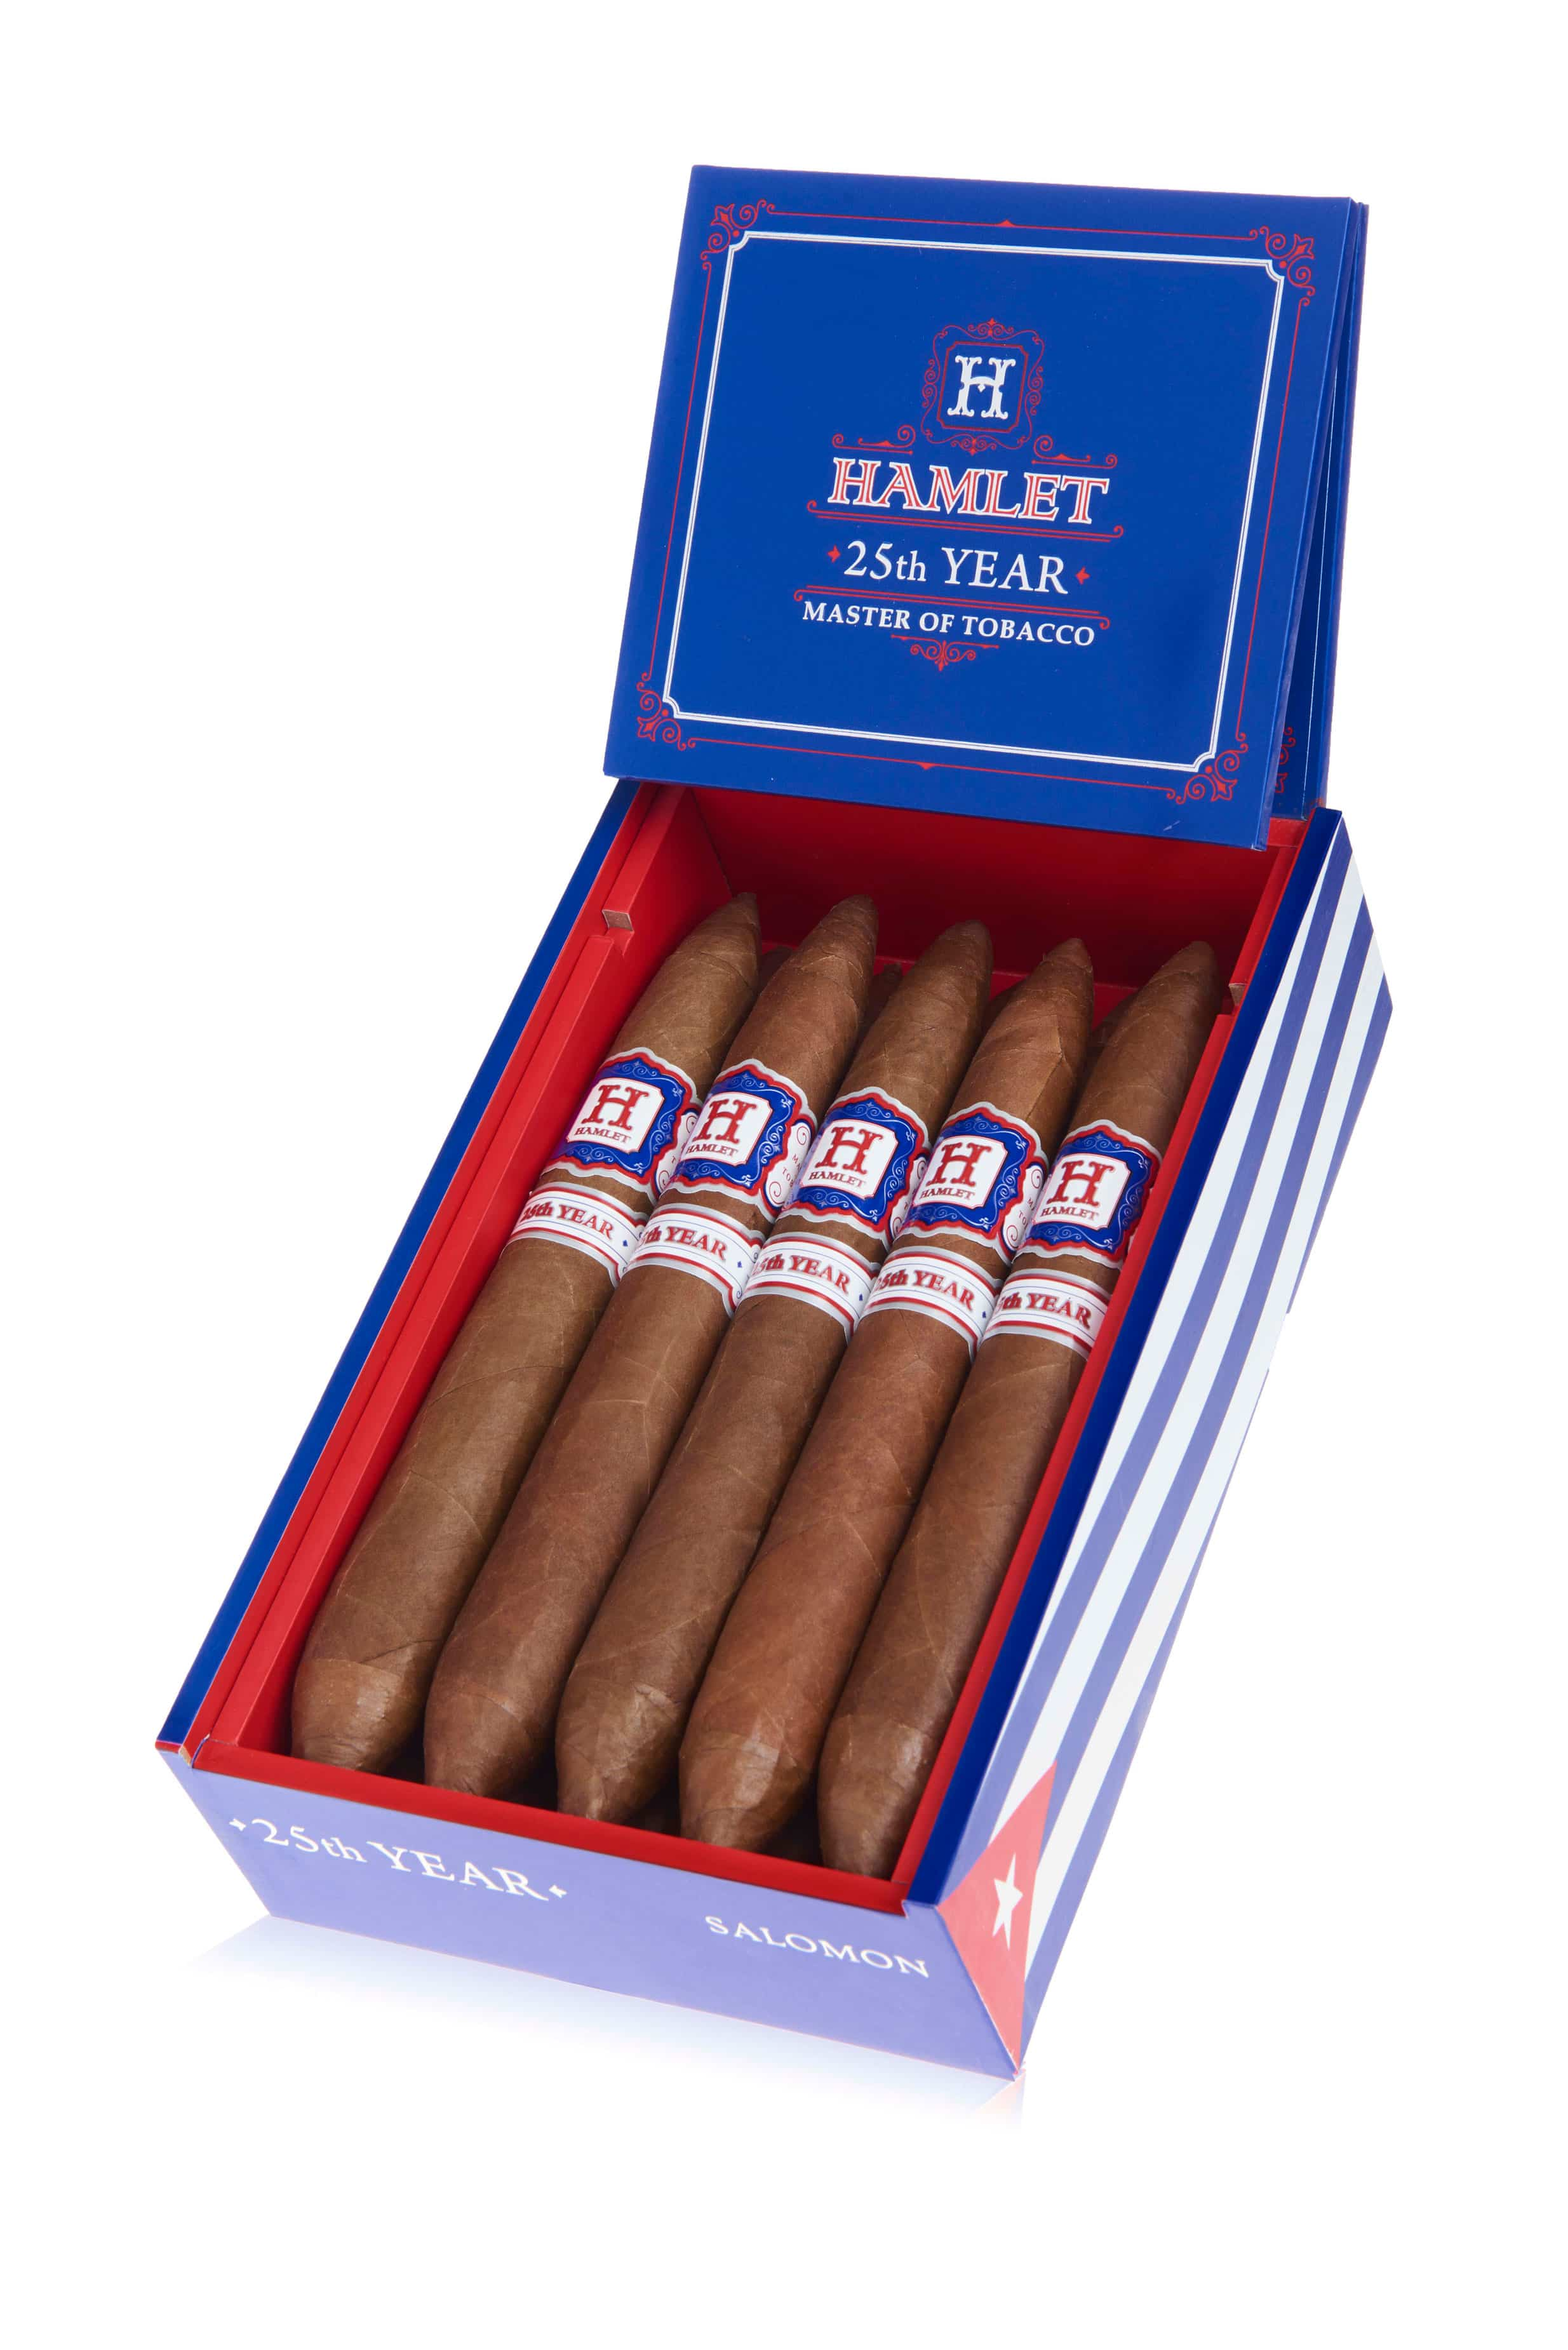 Cigar News: Rocky Patel Adds Hamlet 25th Year Salomon